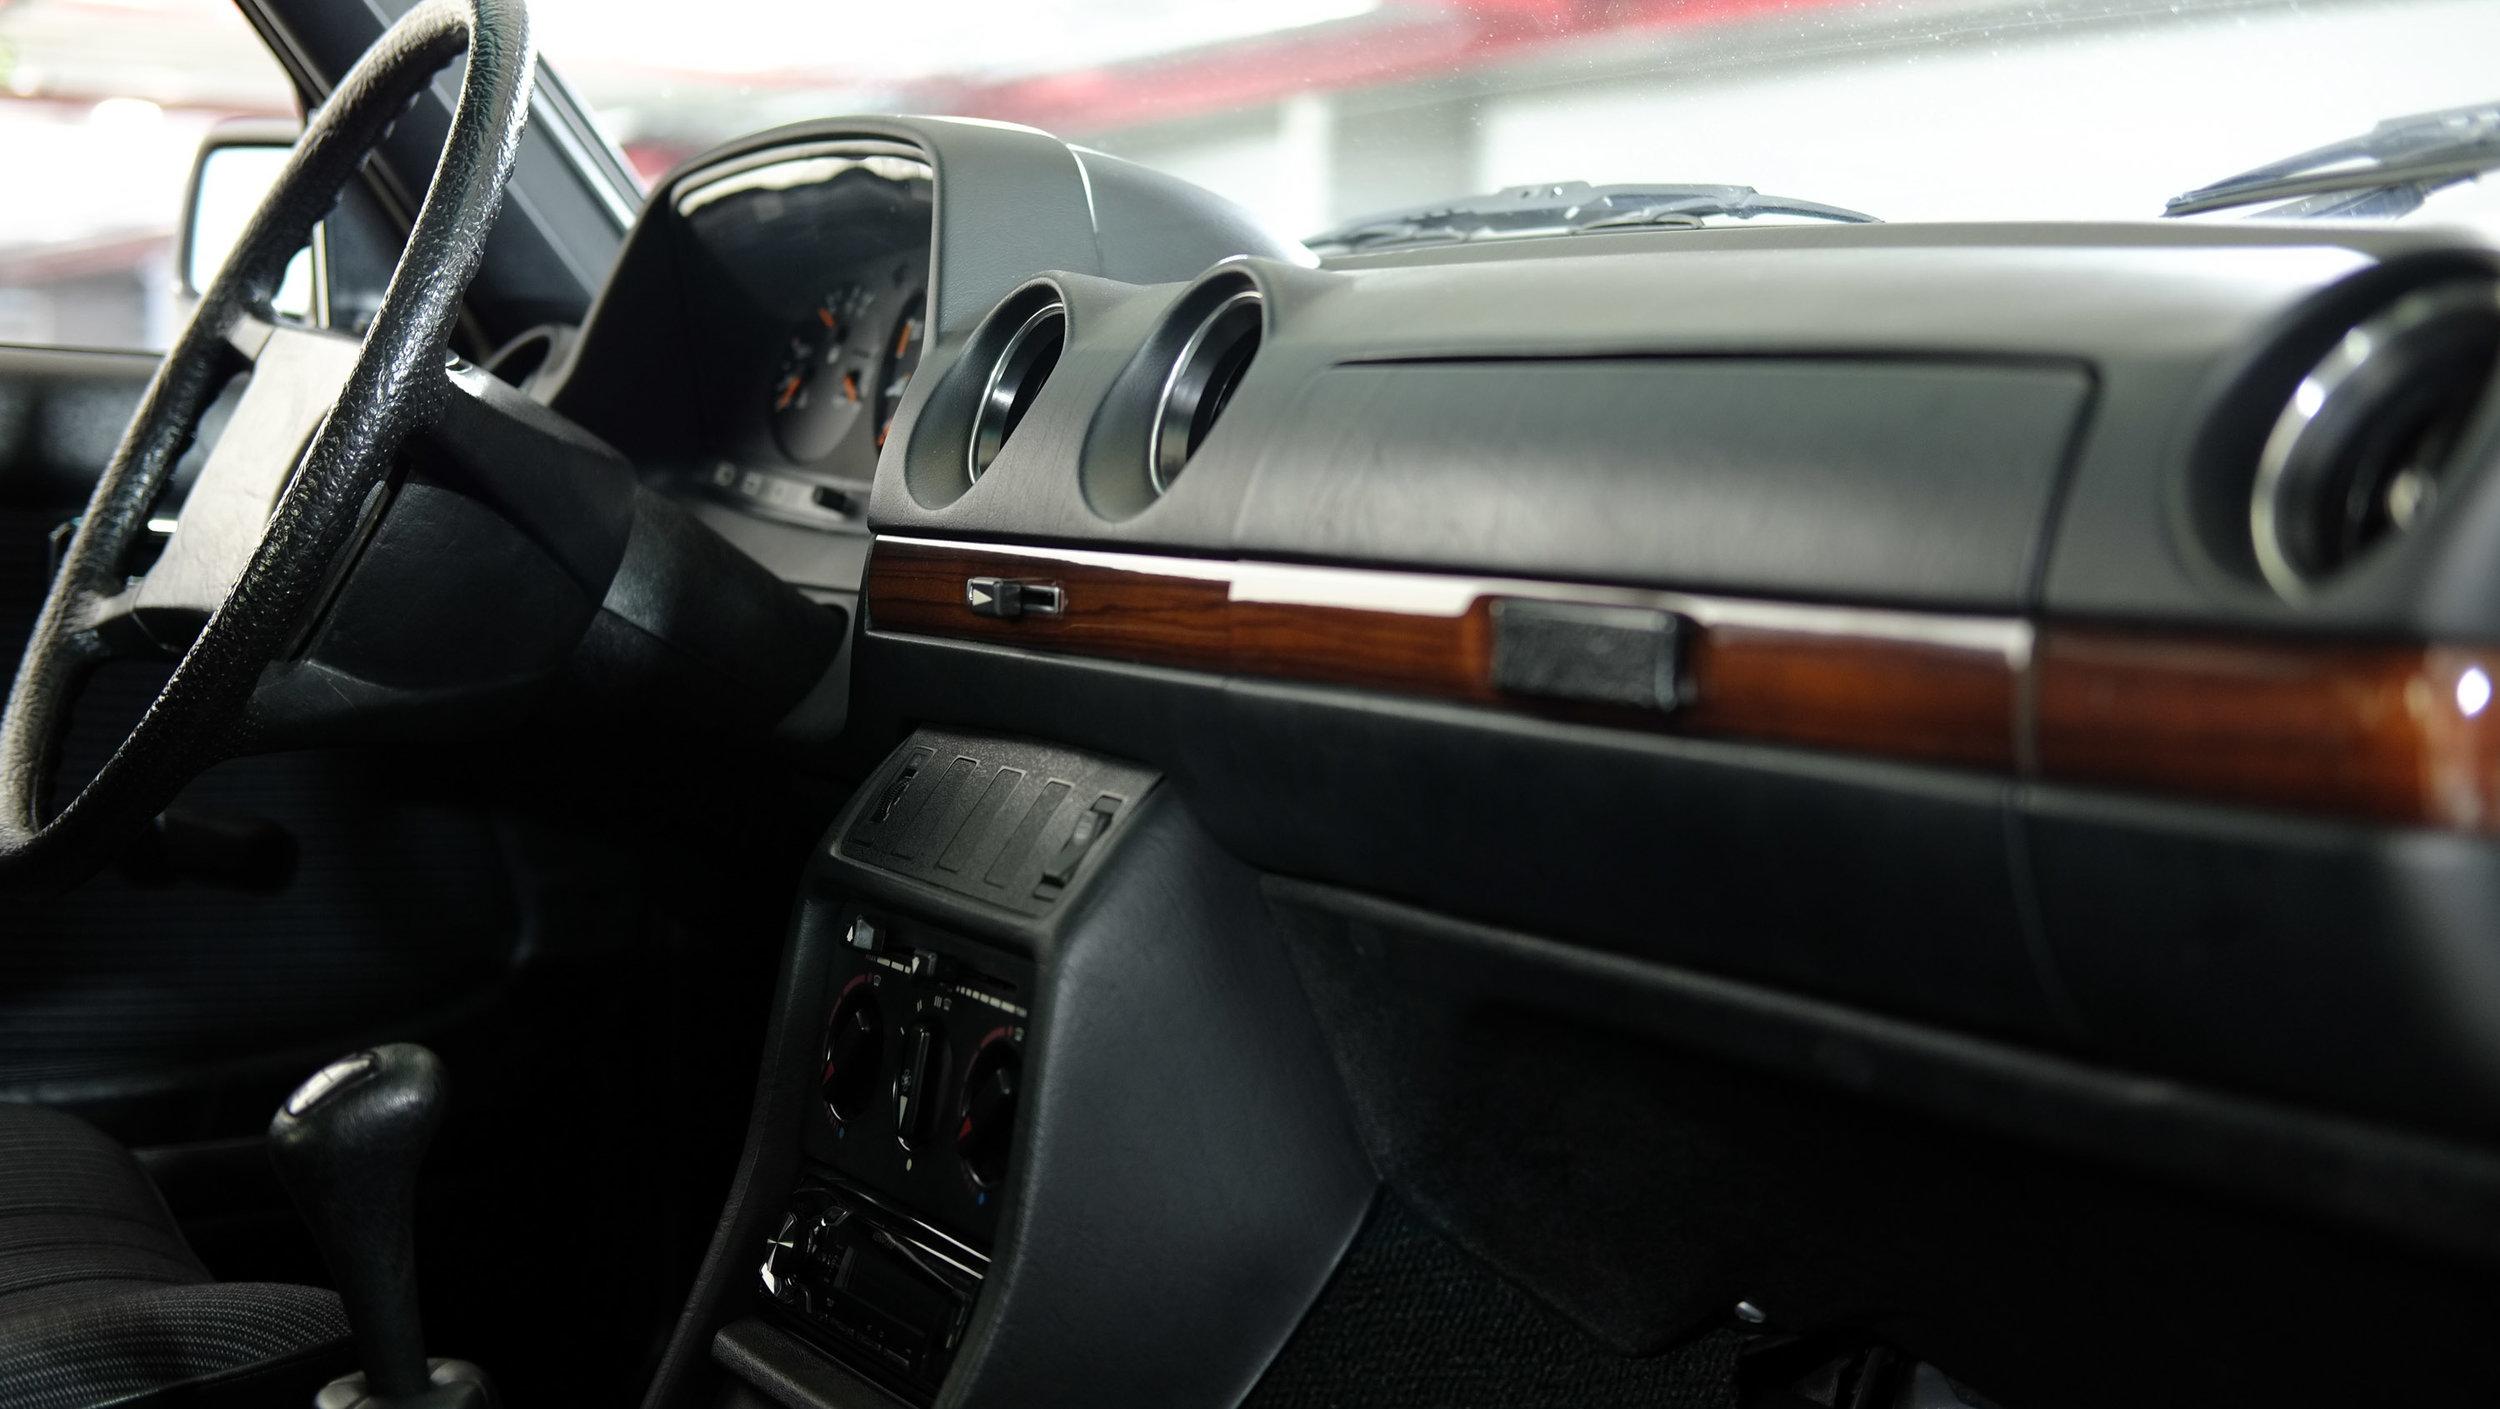 coolnvintage Mercedes-Benz W123 300D (30 of 59).jpg